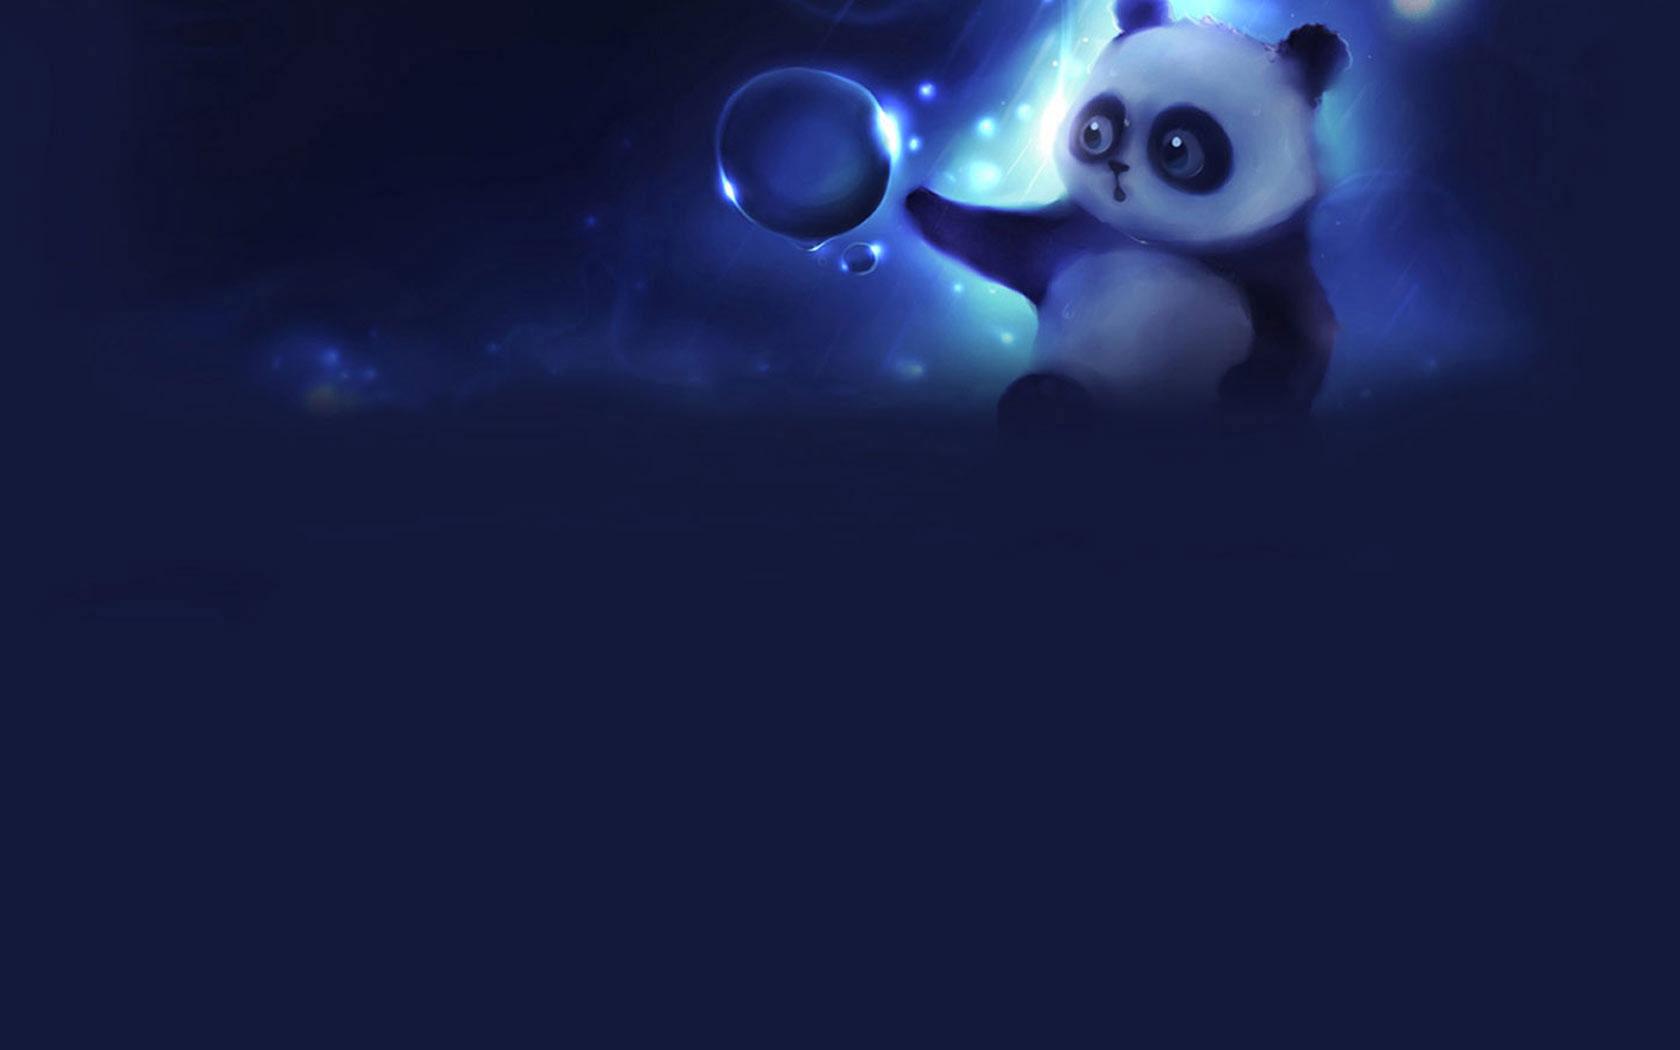 panda cartoon wallpaper comics desktop background Cartoon Wallpapers 1680x1050